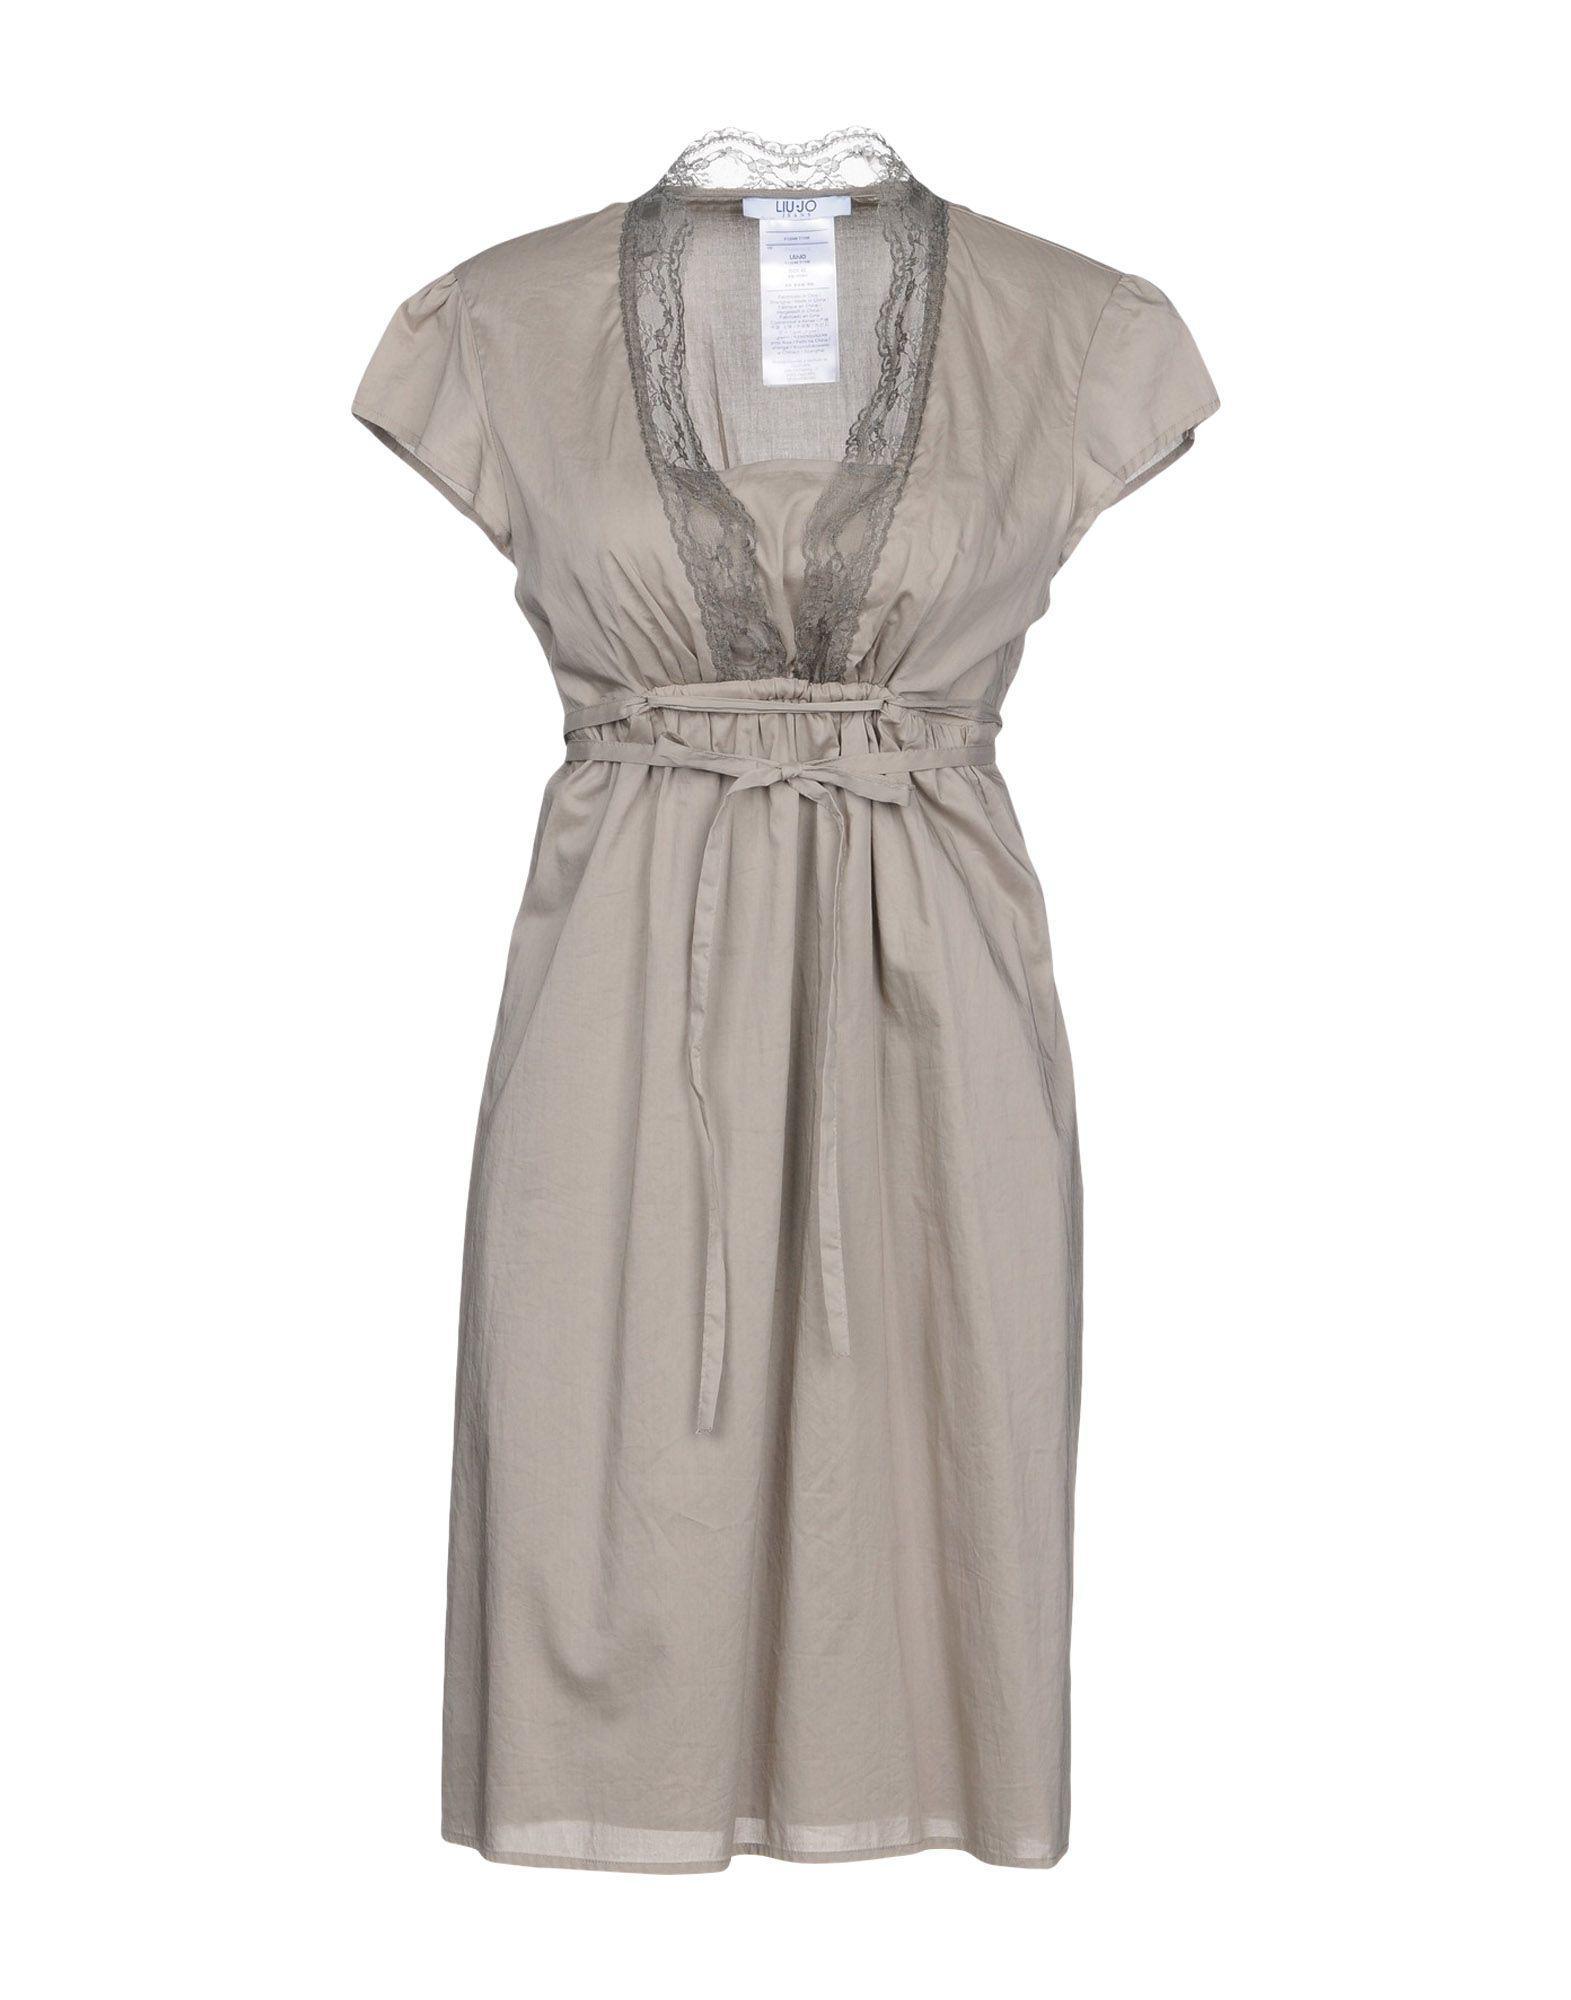 d233bf0a2af41 Lyst - Liu Jo Short Dress in Gray